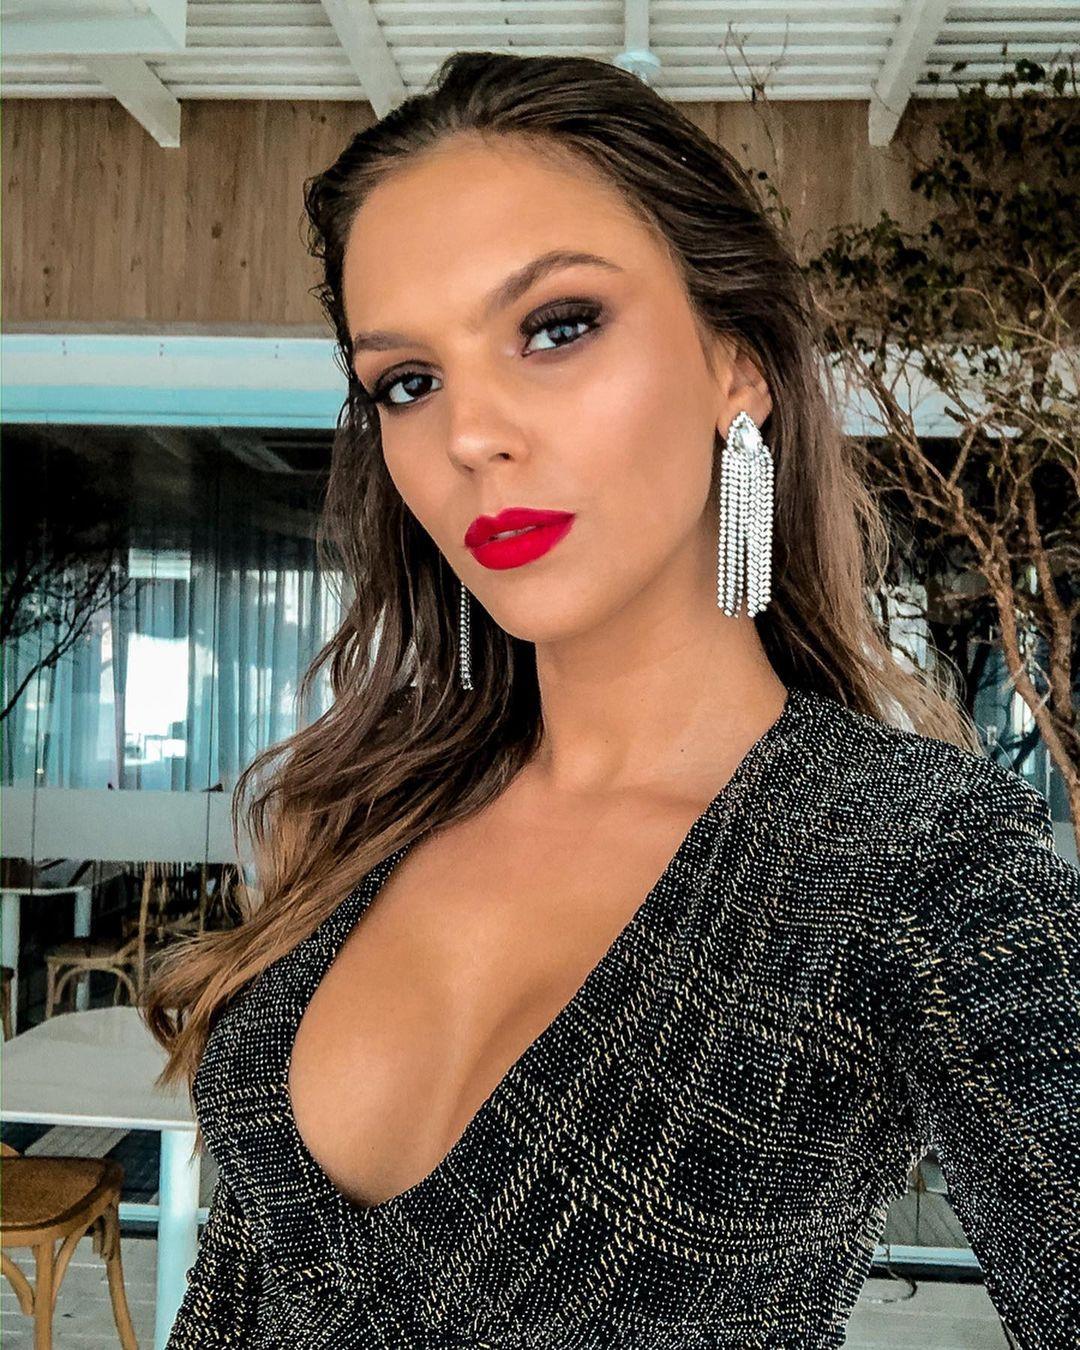 ana flavia giacomini, miss ilha dos lobos mundo 2019. - Página 5 Fwwnwb10